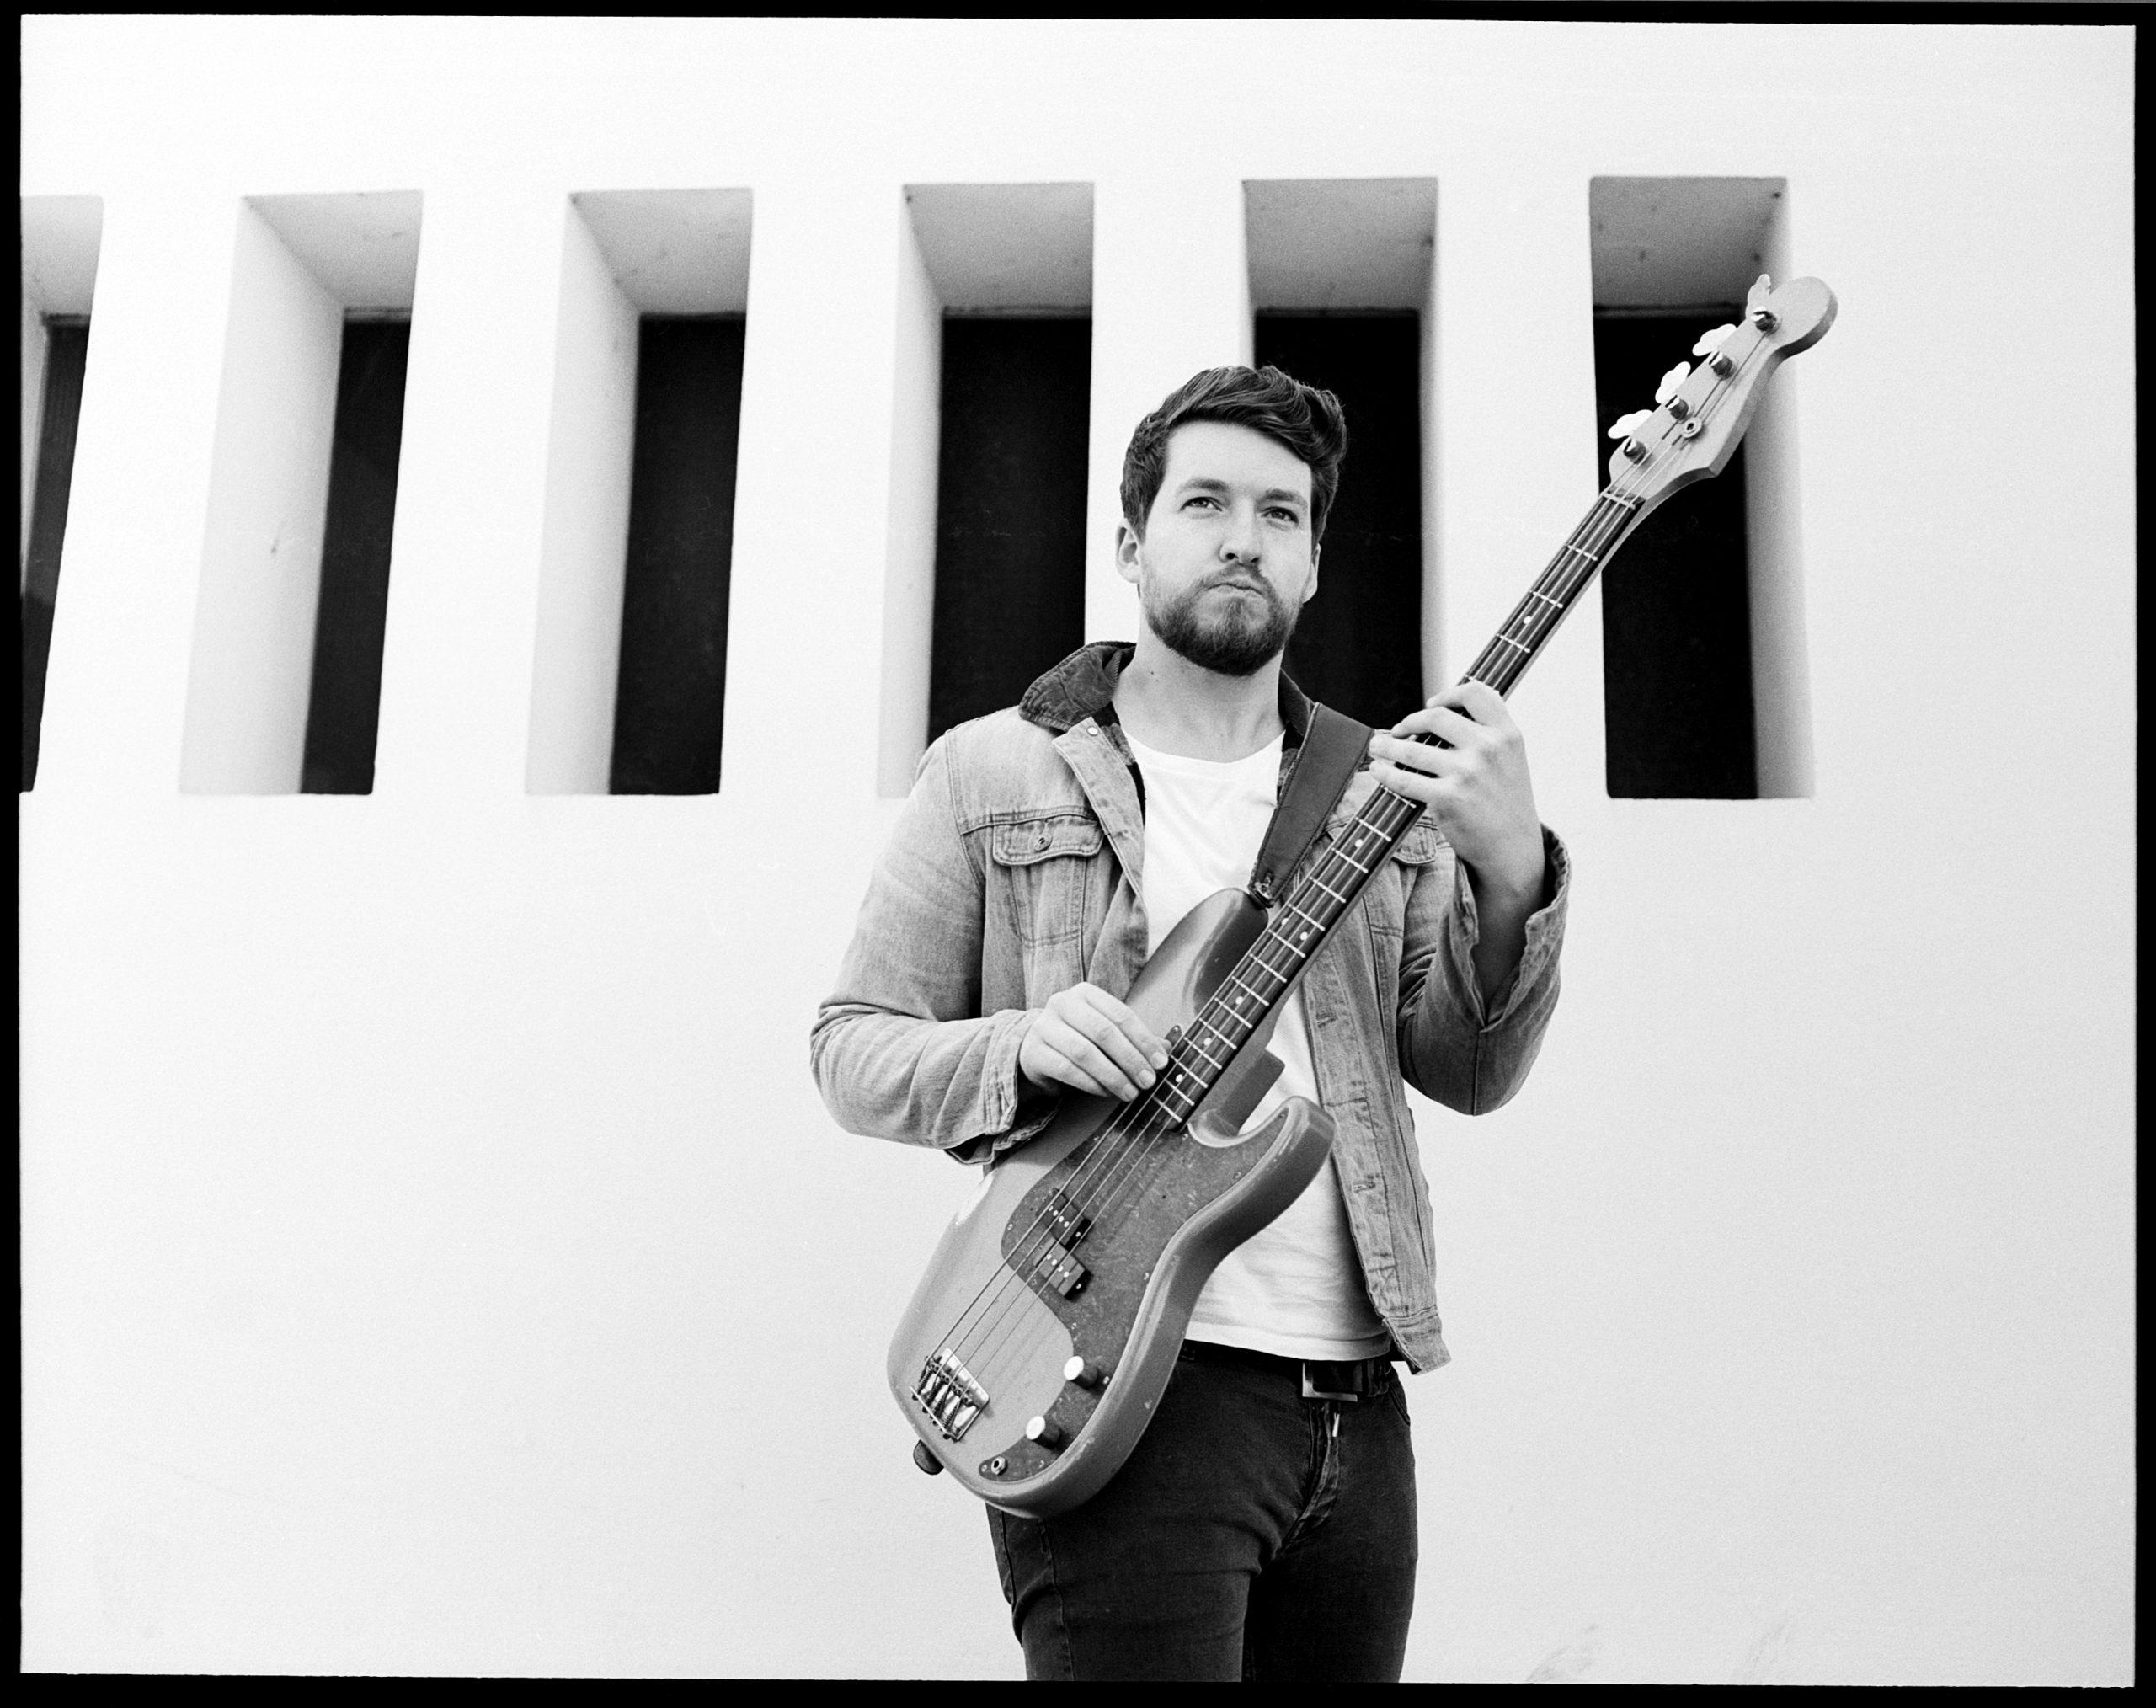 Mann spielt Bass vor weißer Wand